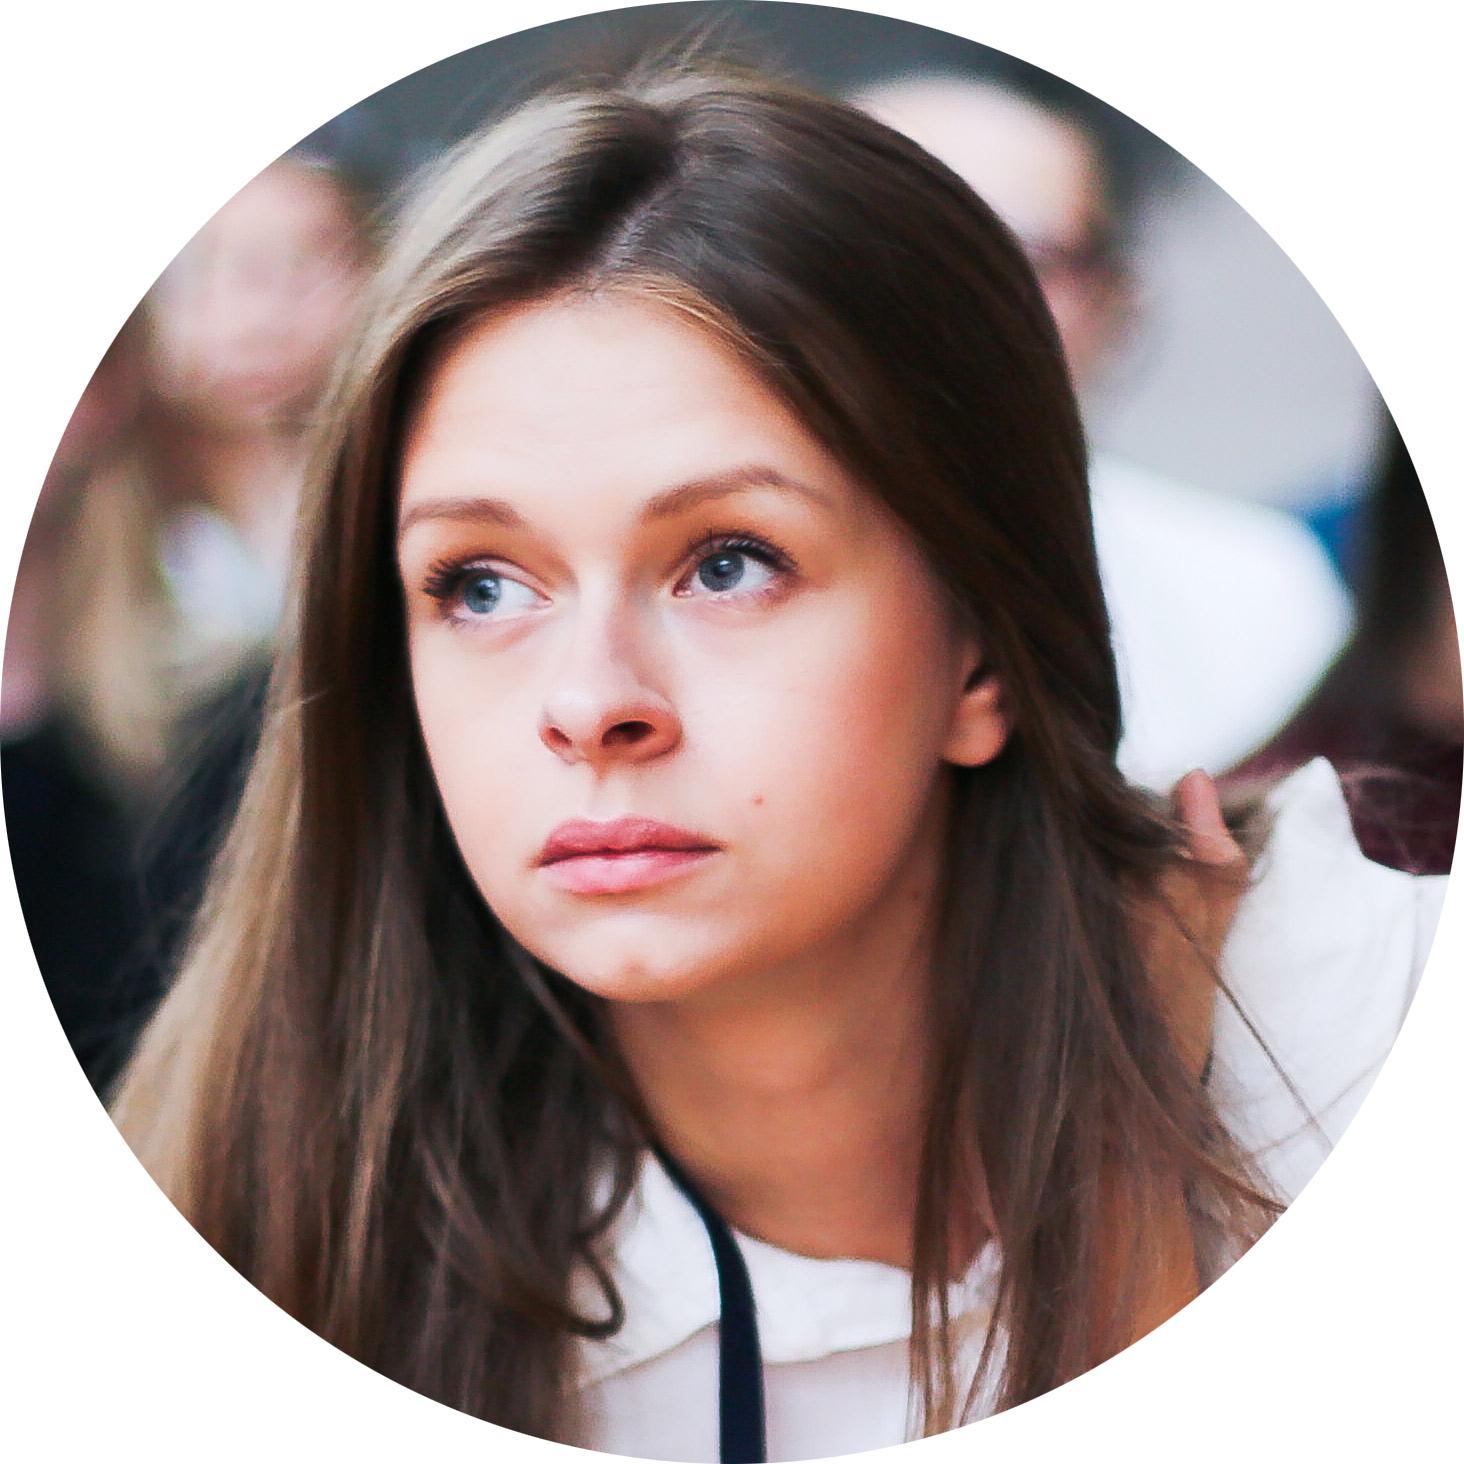 ICloud Valeria Kovalenko nudes (12 photo), Topless, Is a cute, Boobs, cameltoe 2017